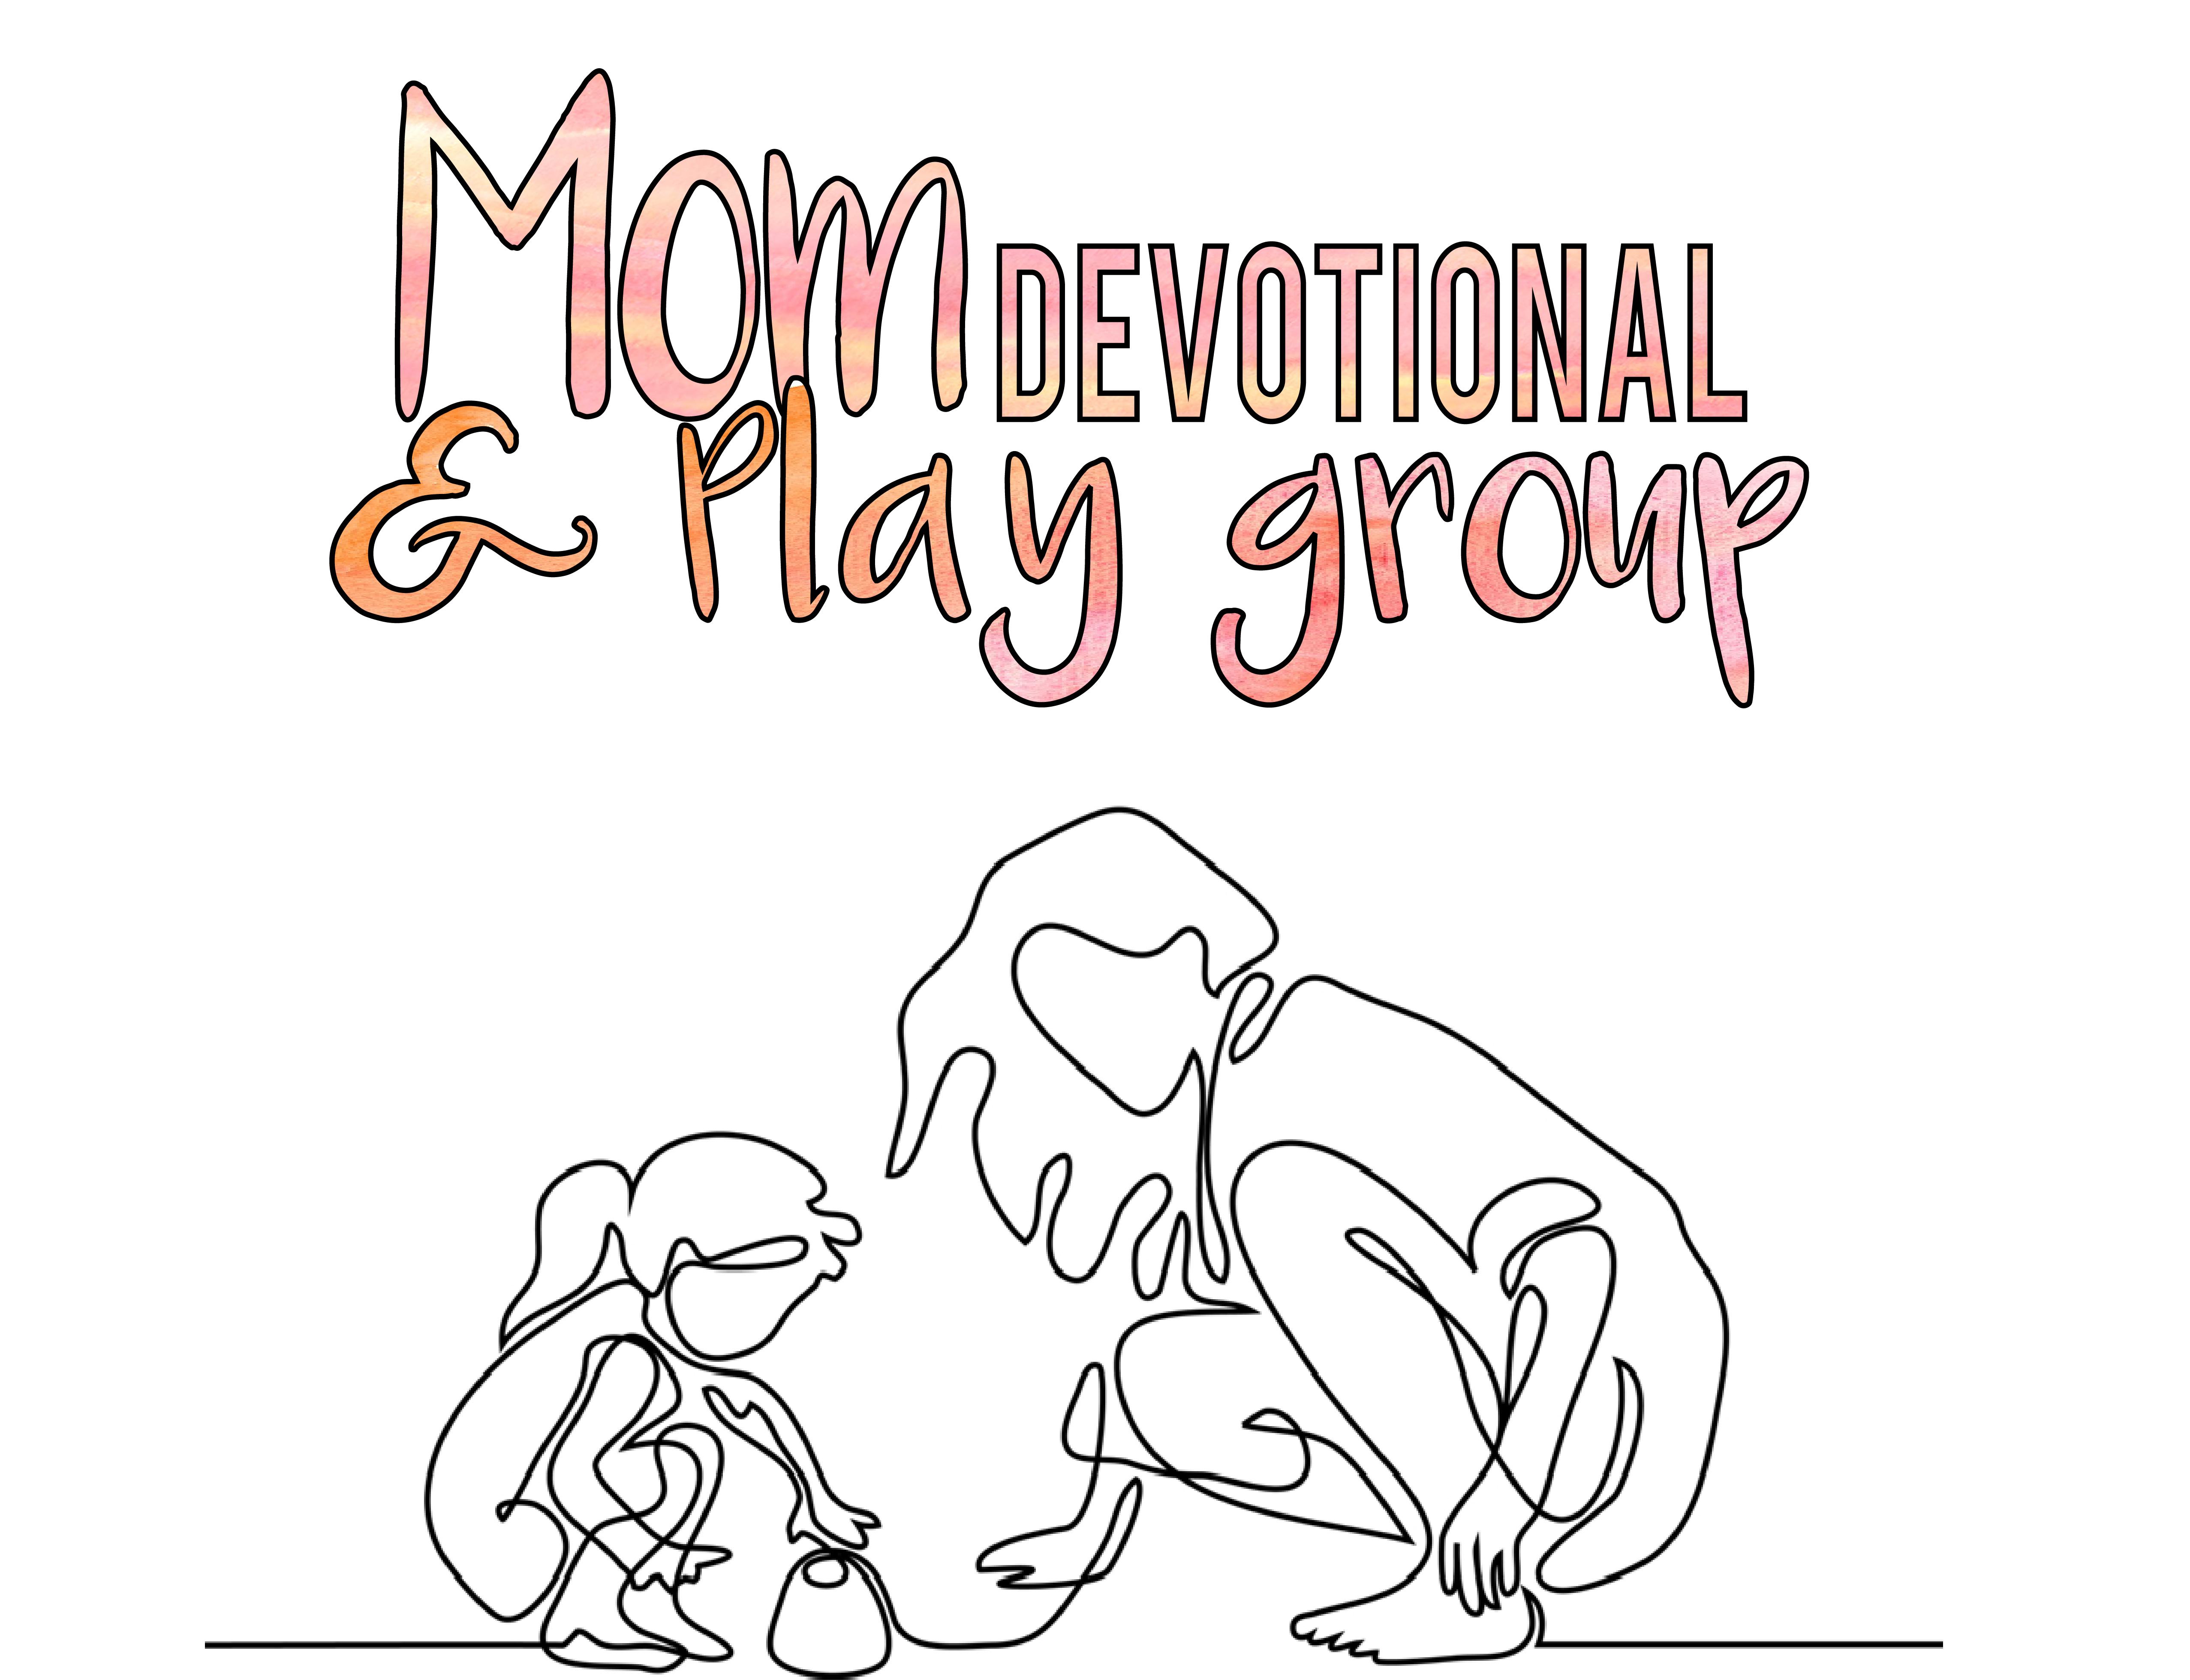 mom devotional play square